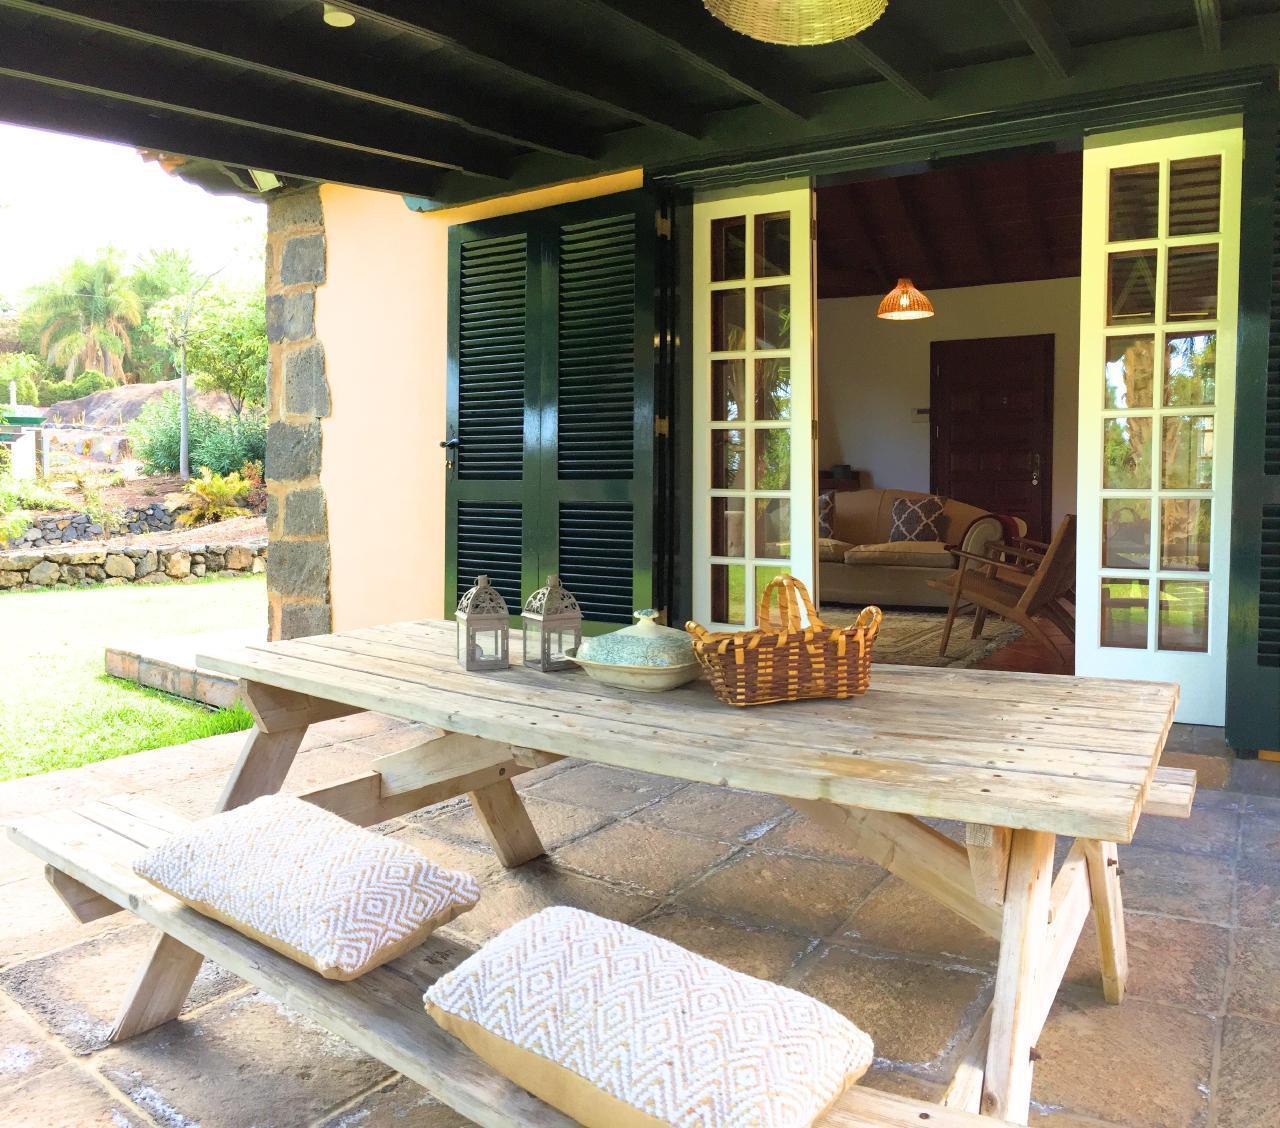 Maison de vacances Kanarisches Haus wundervoller privater Garten (2412059), San Miguel, Ténérife, Iles Canaries, Espagne, image 2